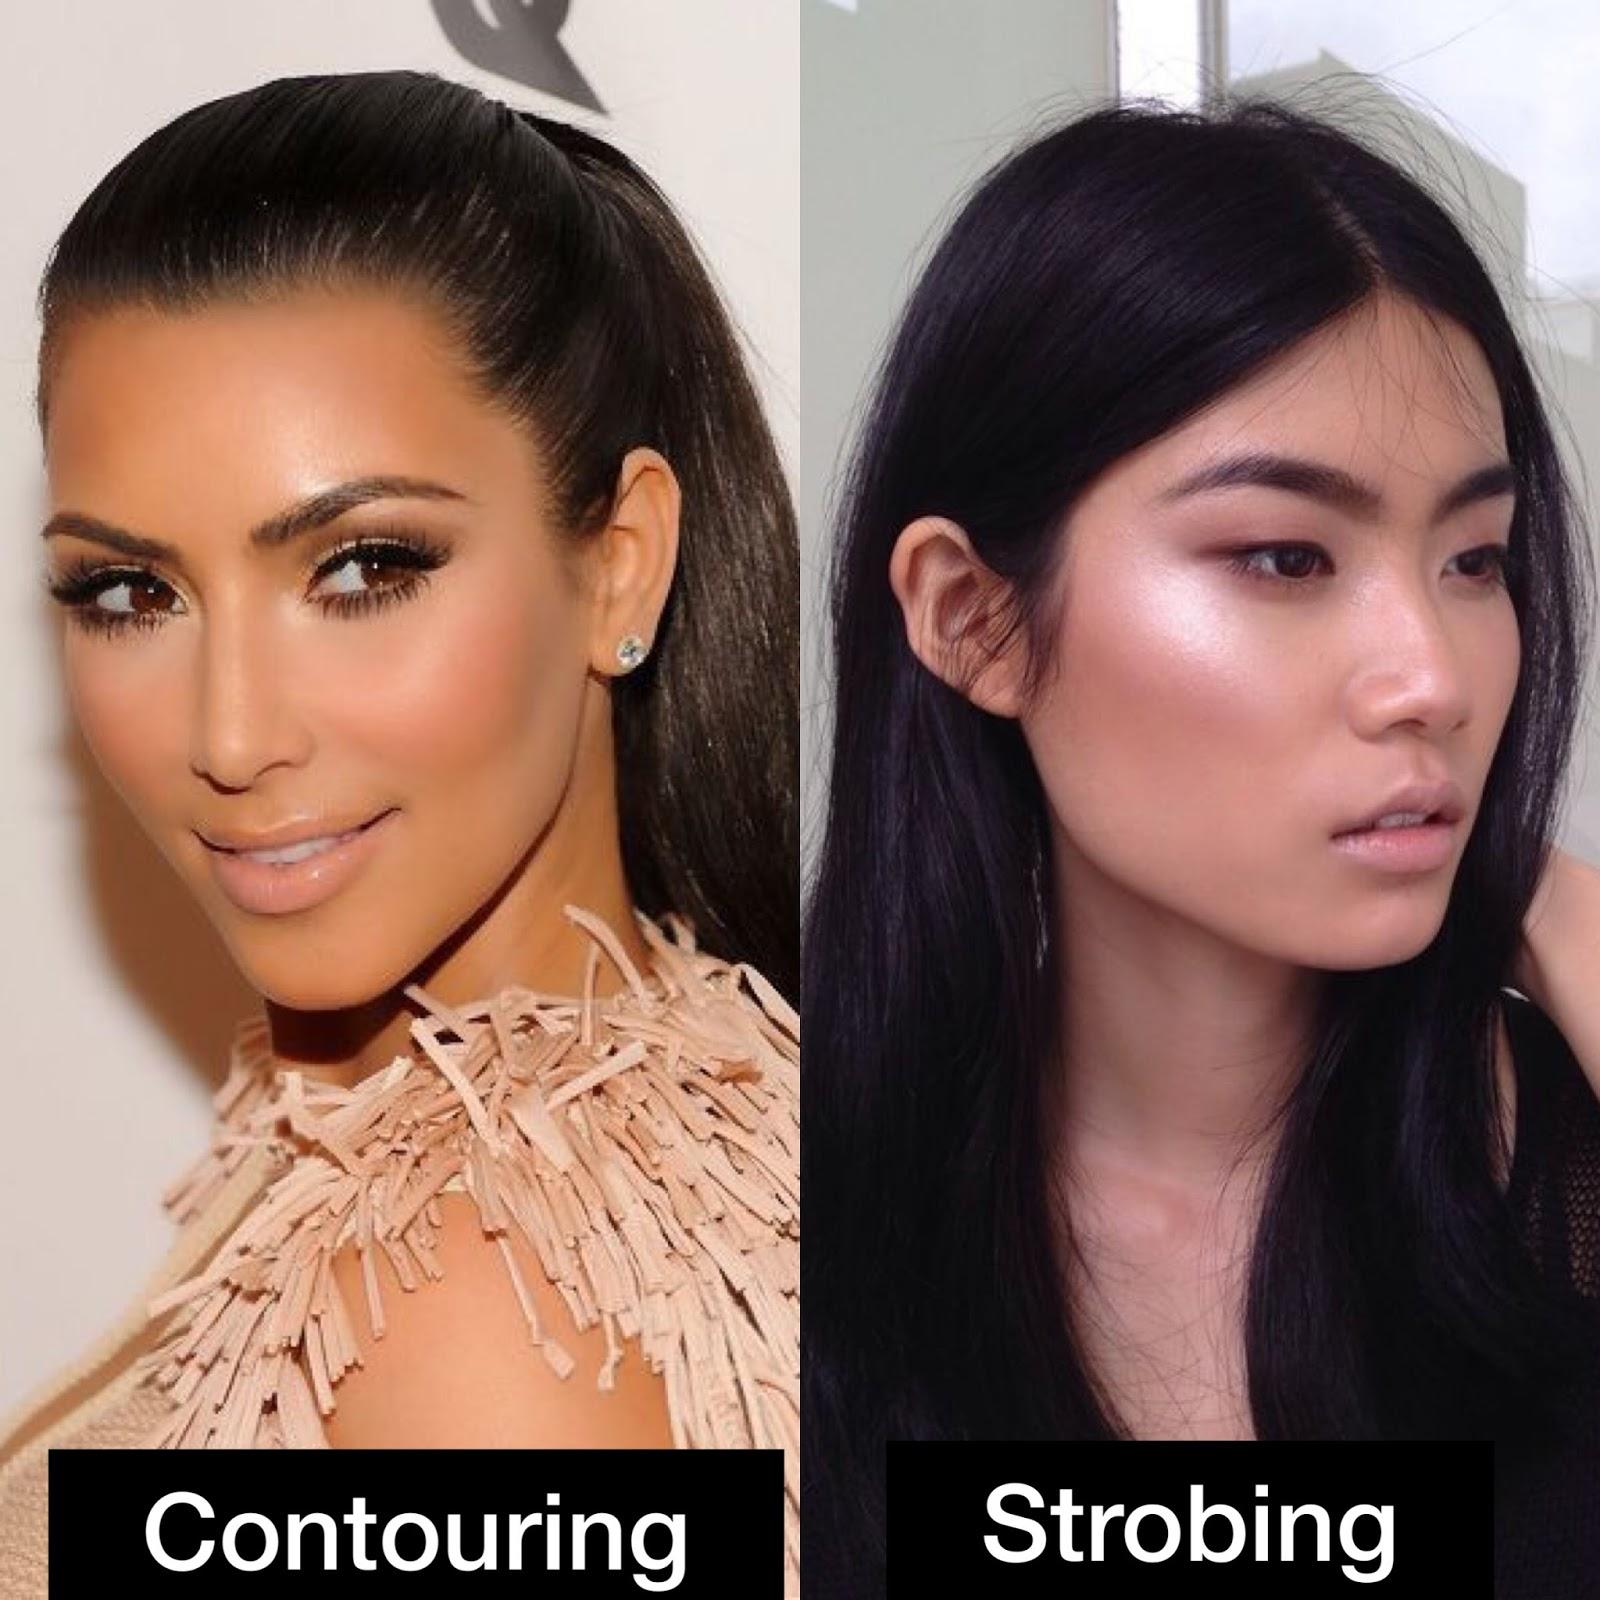 contouring vs strobing